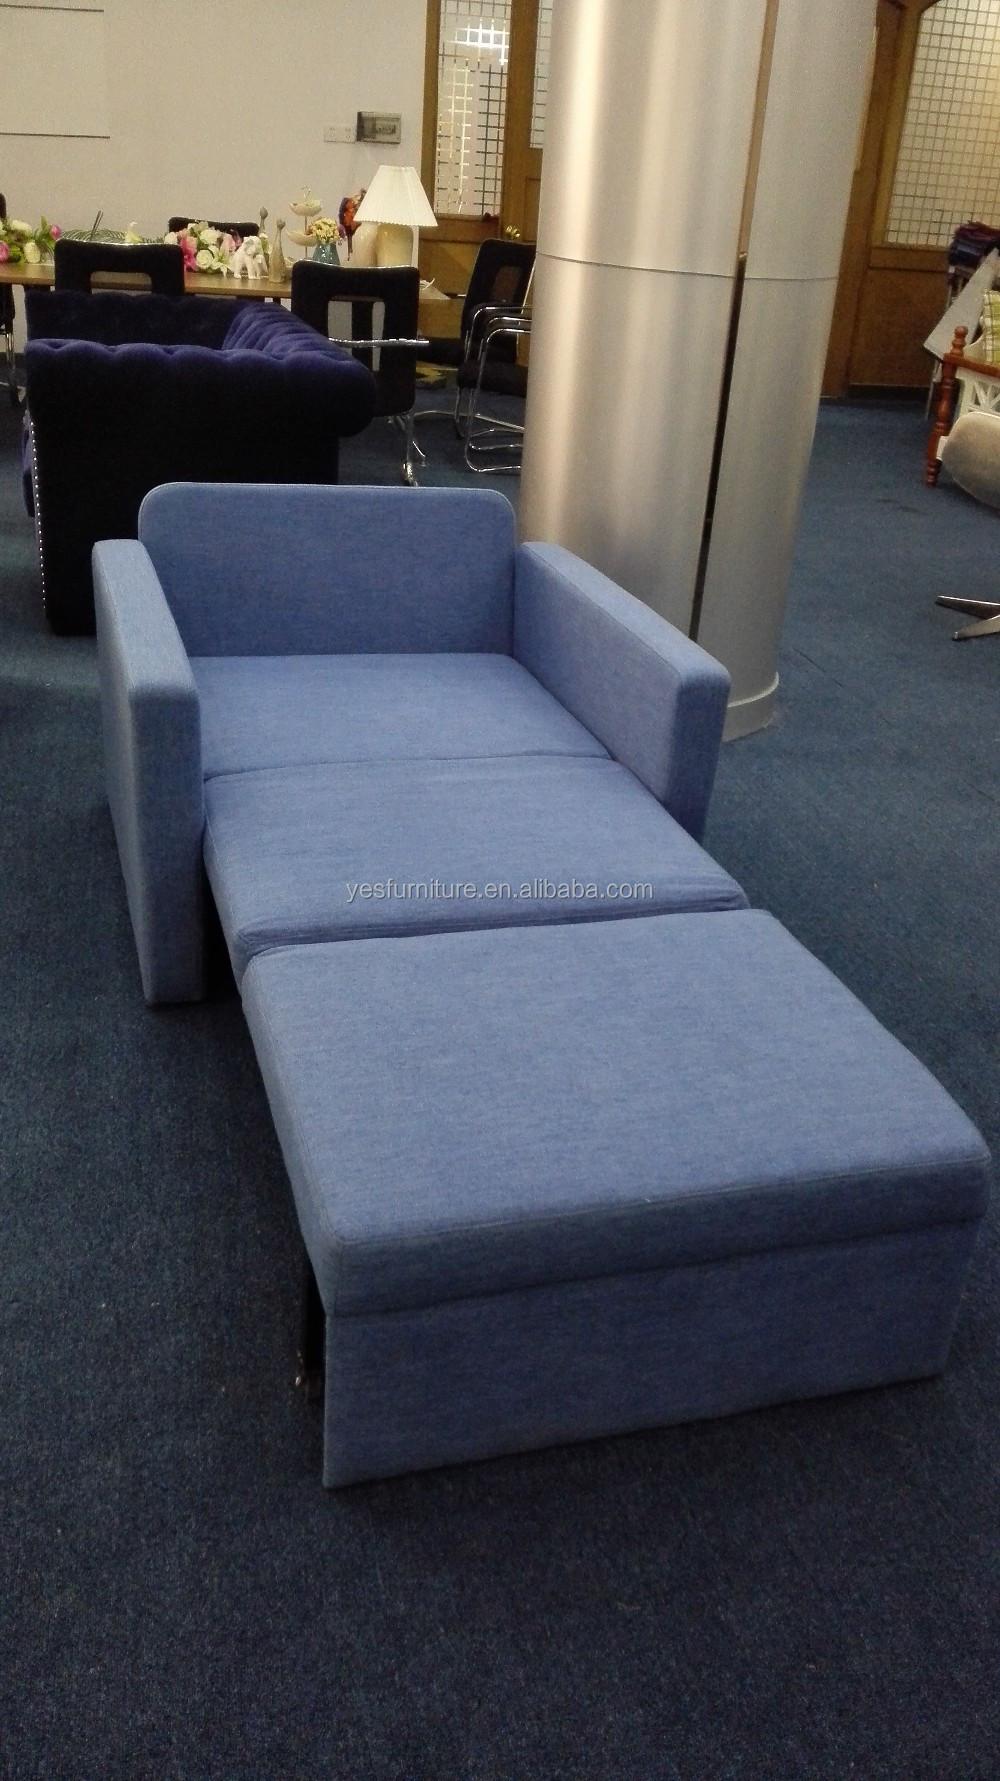 Easy Folding Single Seat Sofa Bed For Single People Buy Single